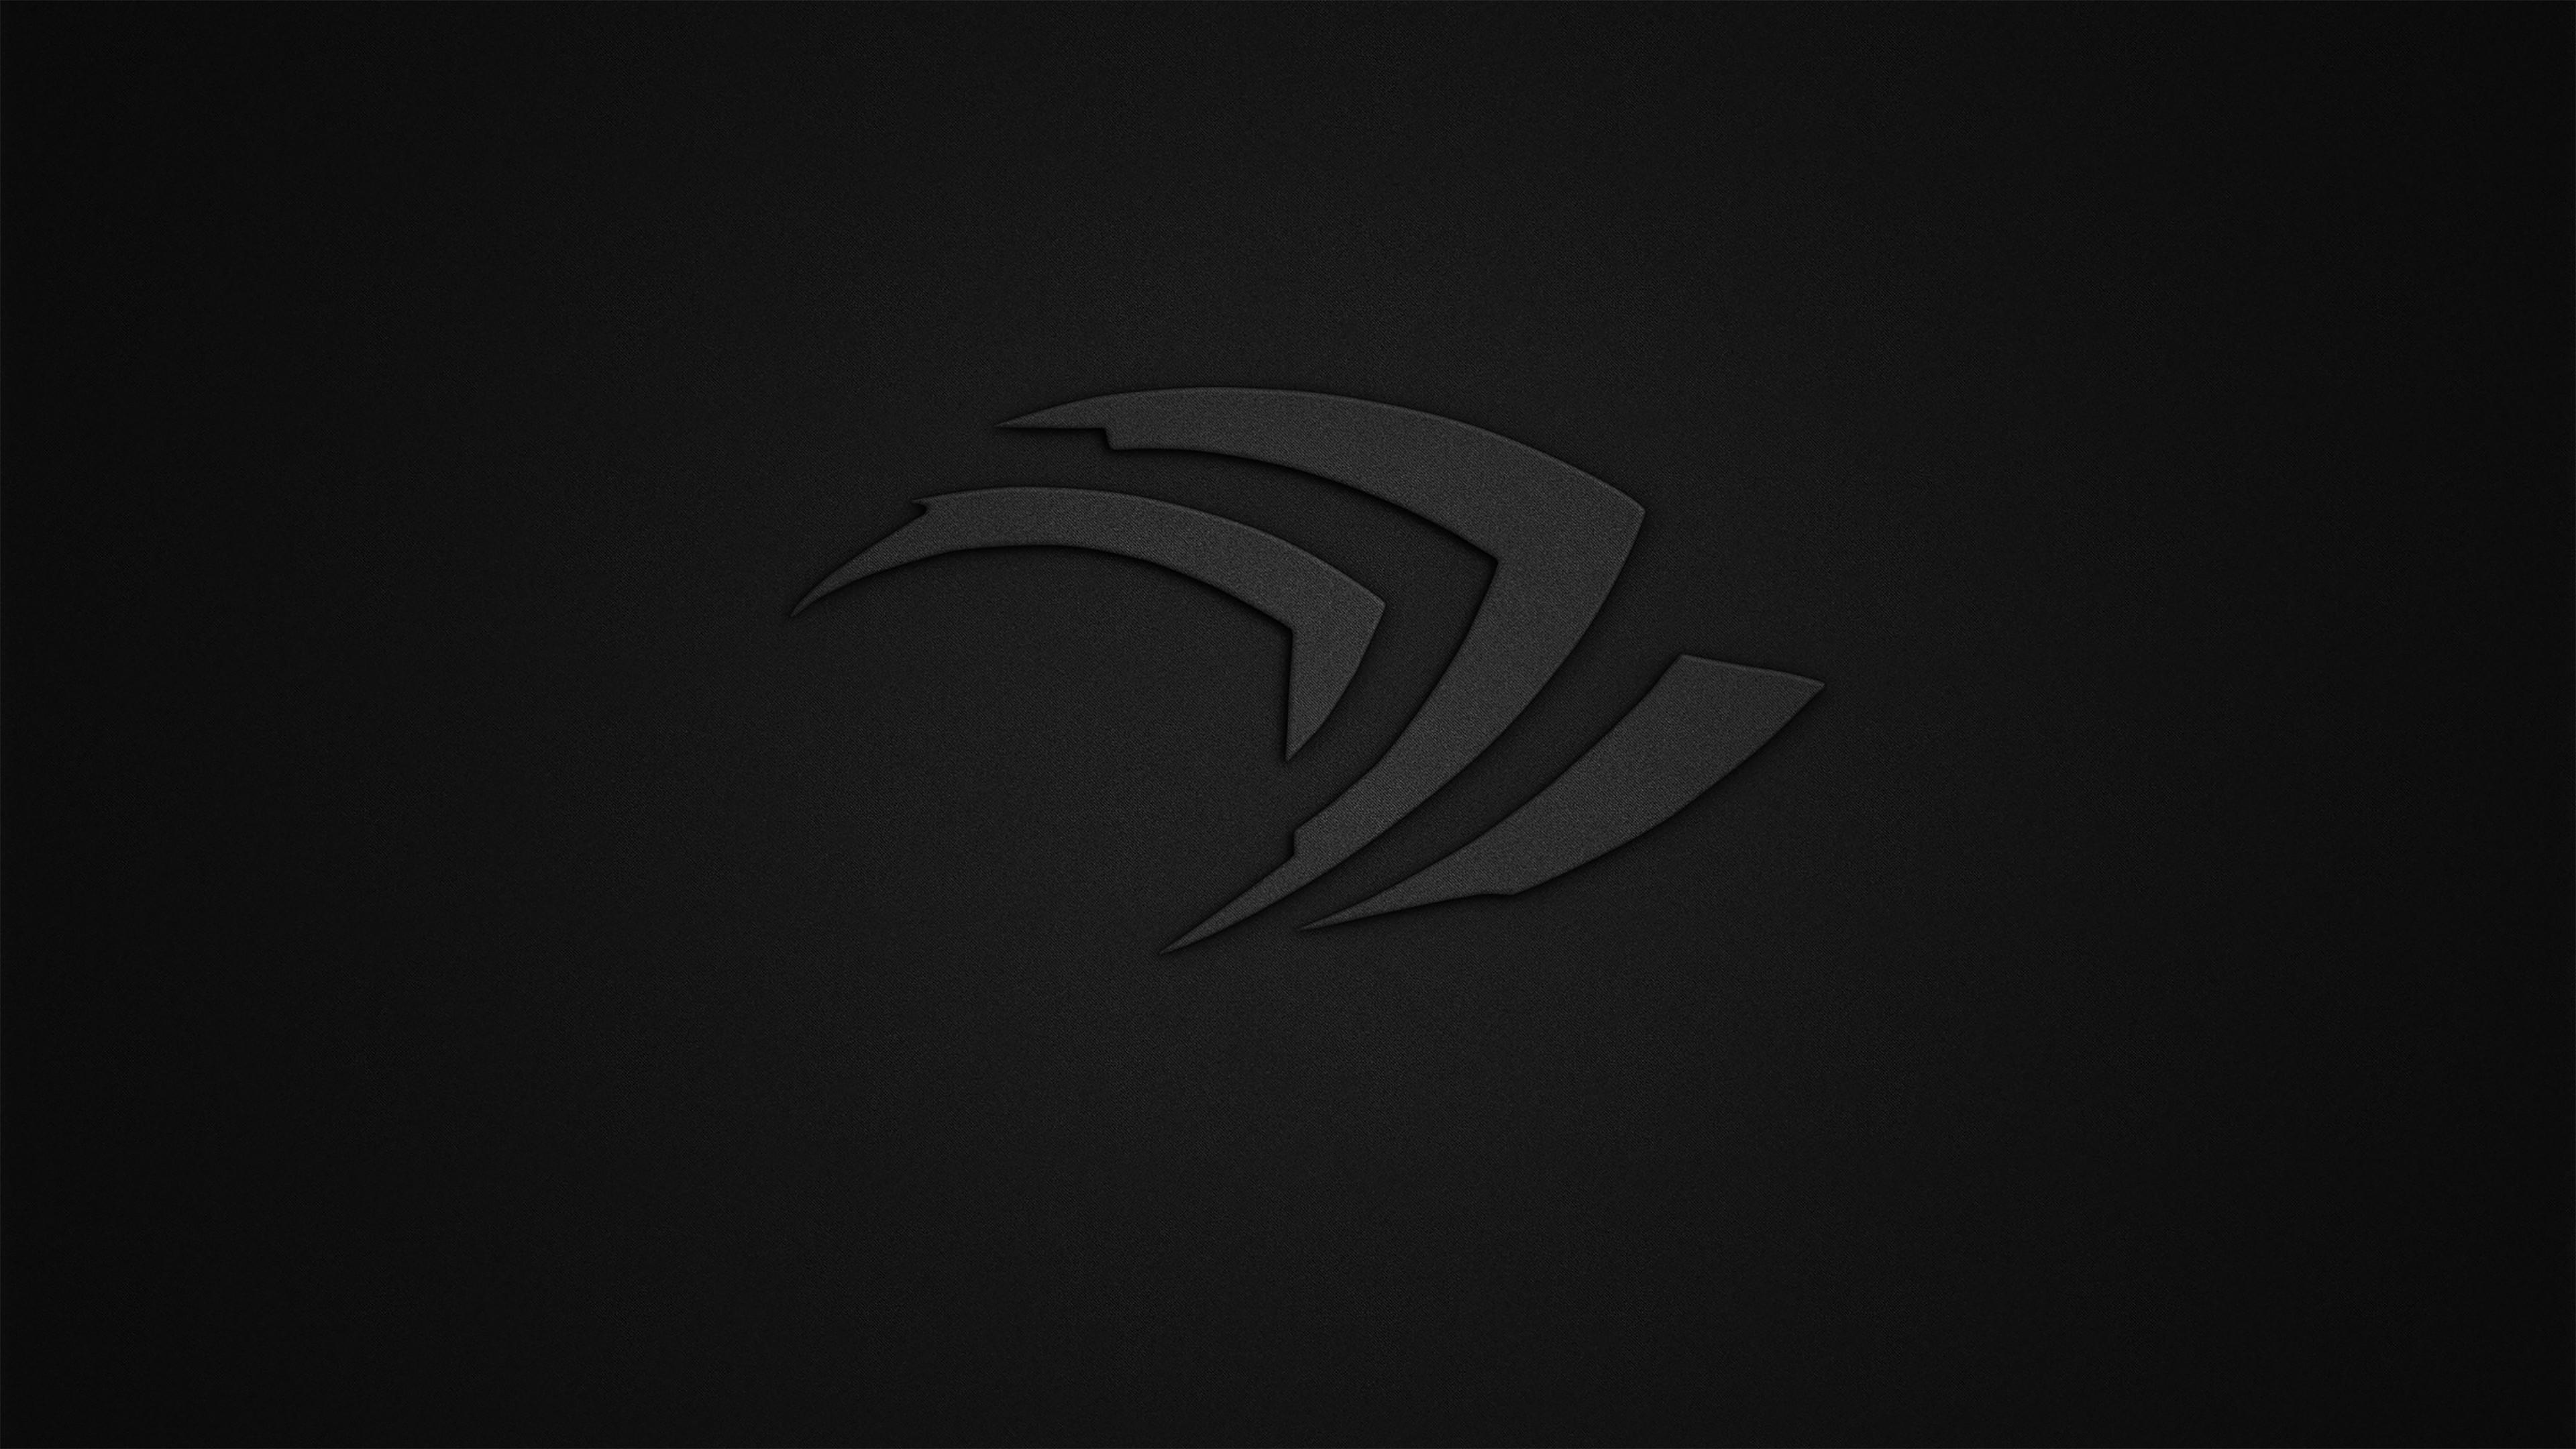 [3840×2160] Nvidia 4k wallpaper …